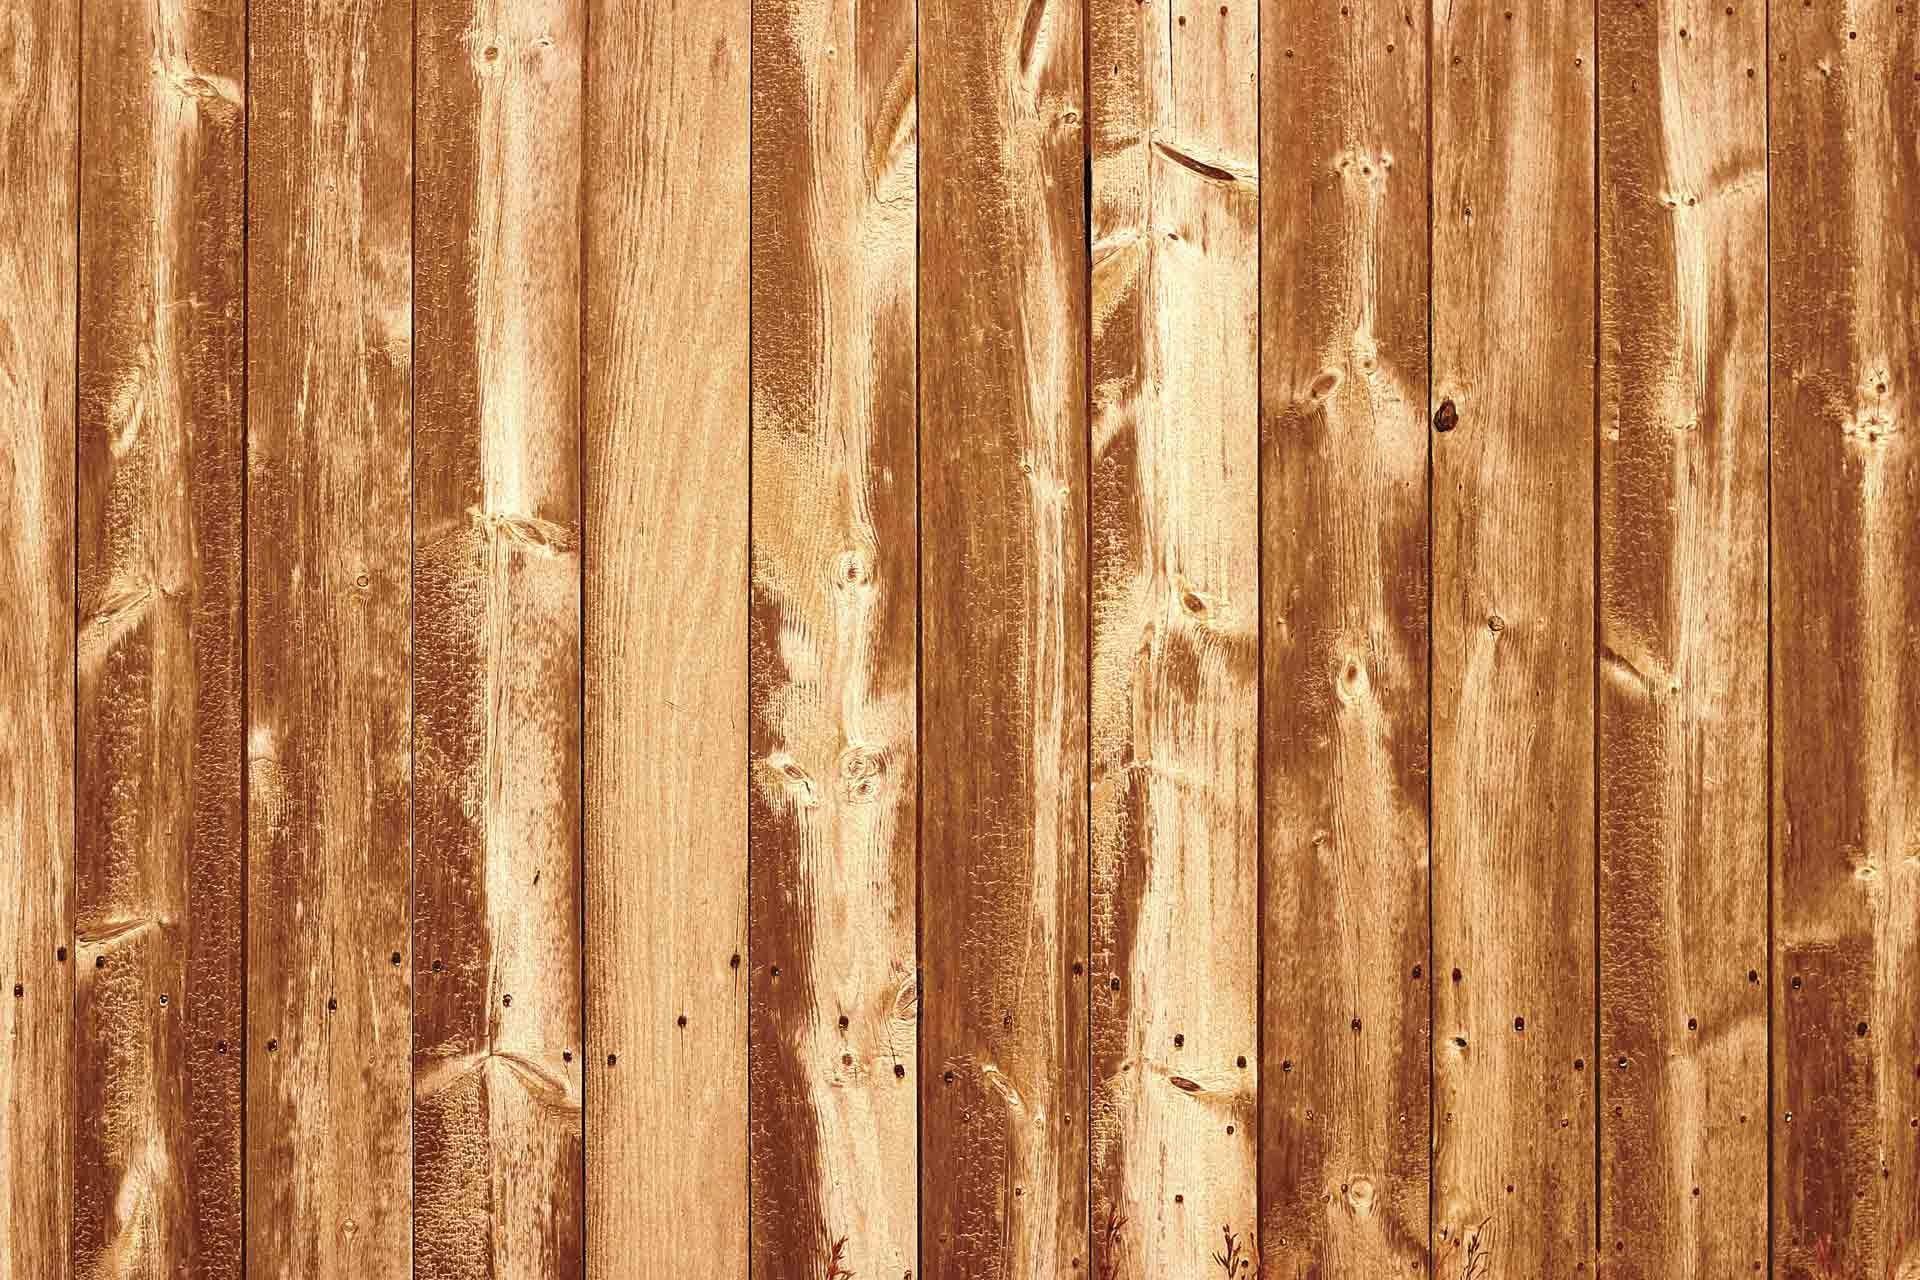 Barn Wood Texture barn wood | barn wood accent wall | barn wood arms | tempat untuk